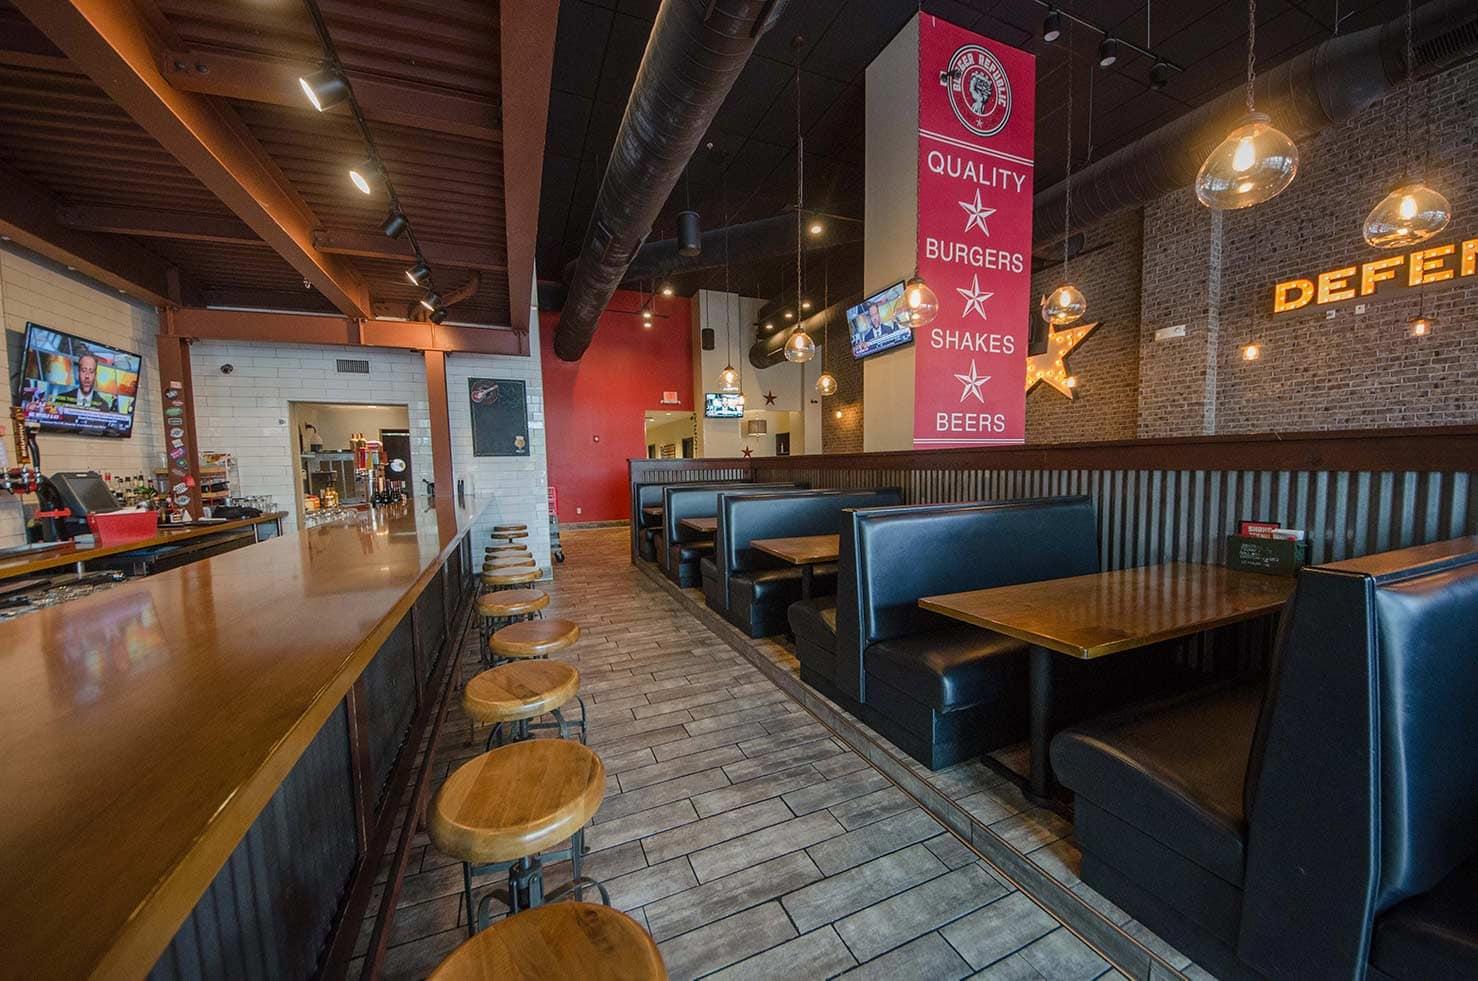 Burger Republic booths and bar